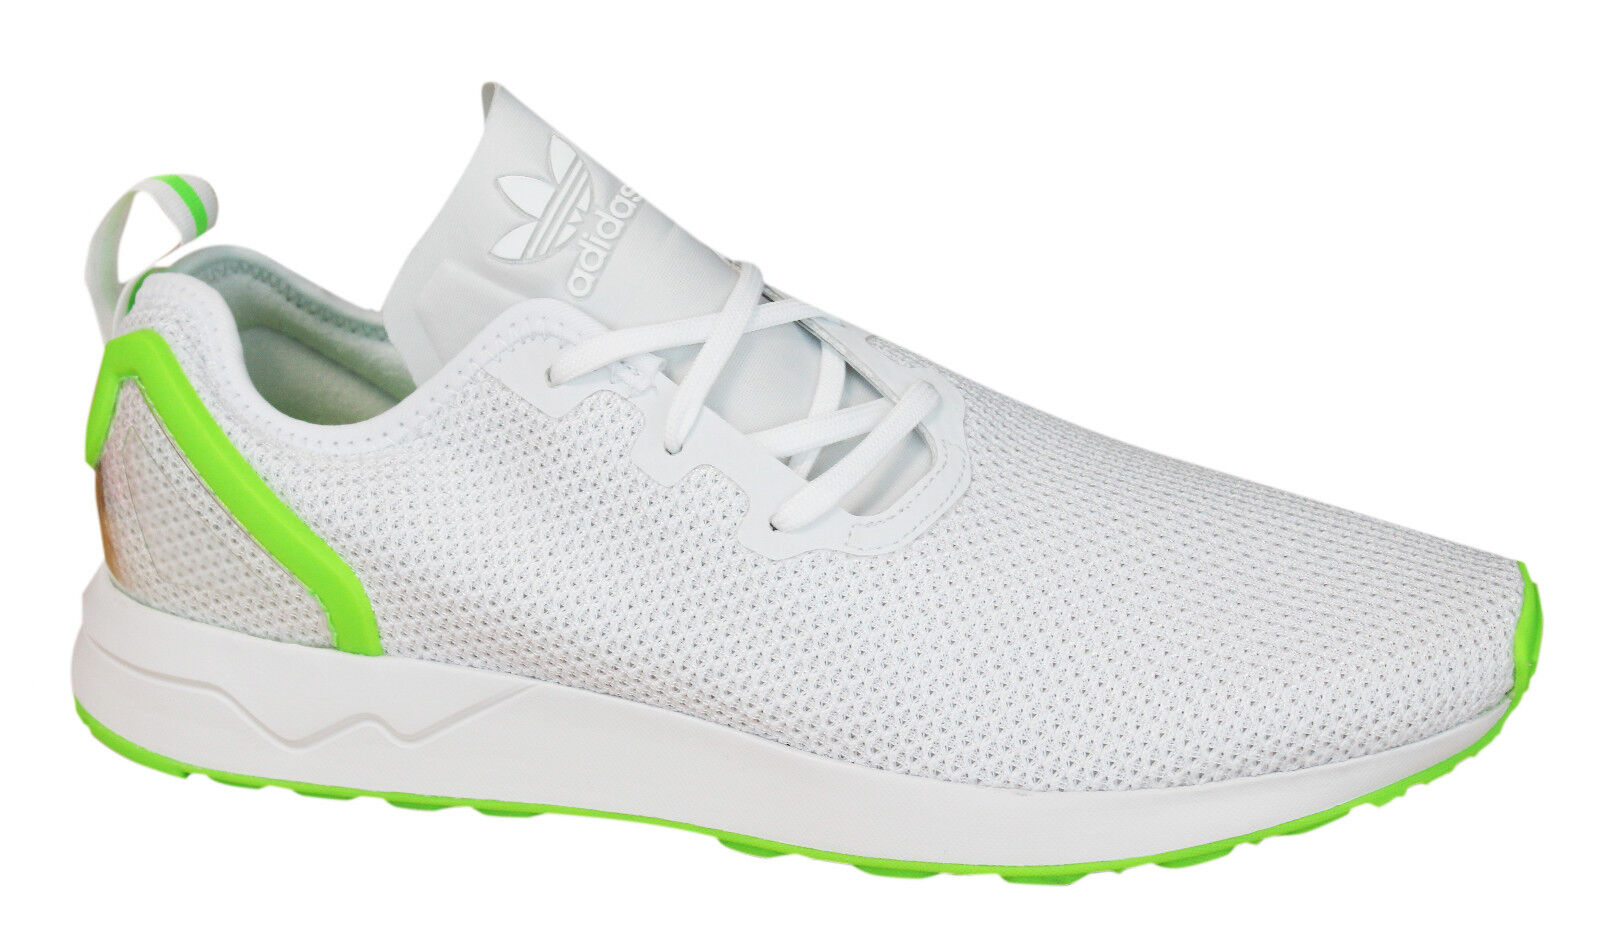 Adidas Originals ZX Flux Adv Asym Mens Trainers Lace Up Shoes White AQ3166 D27